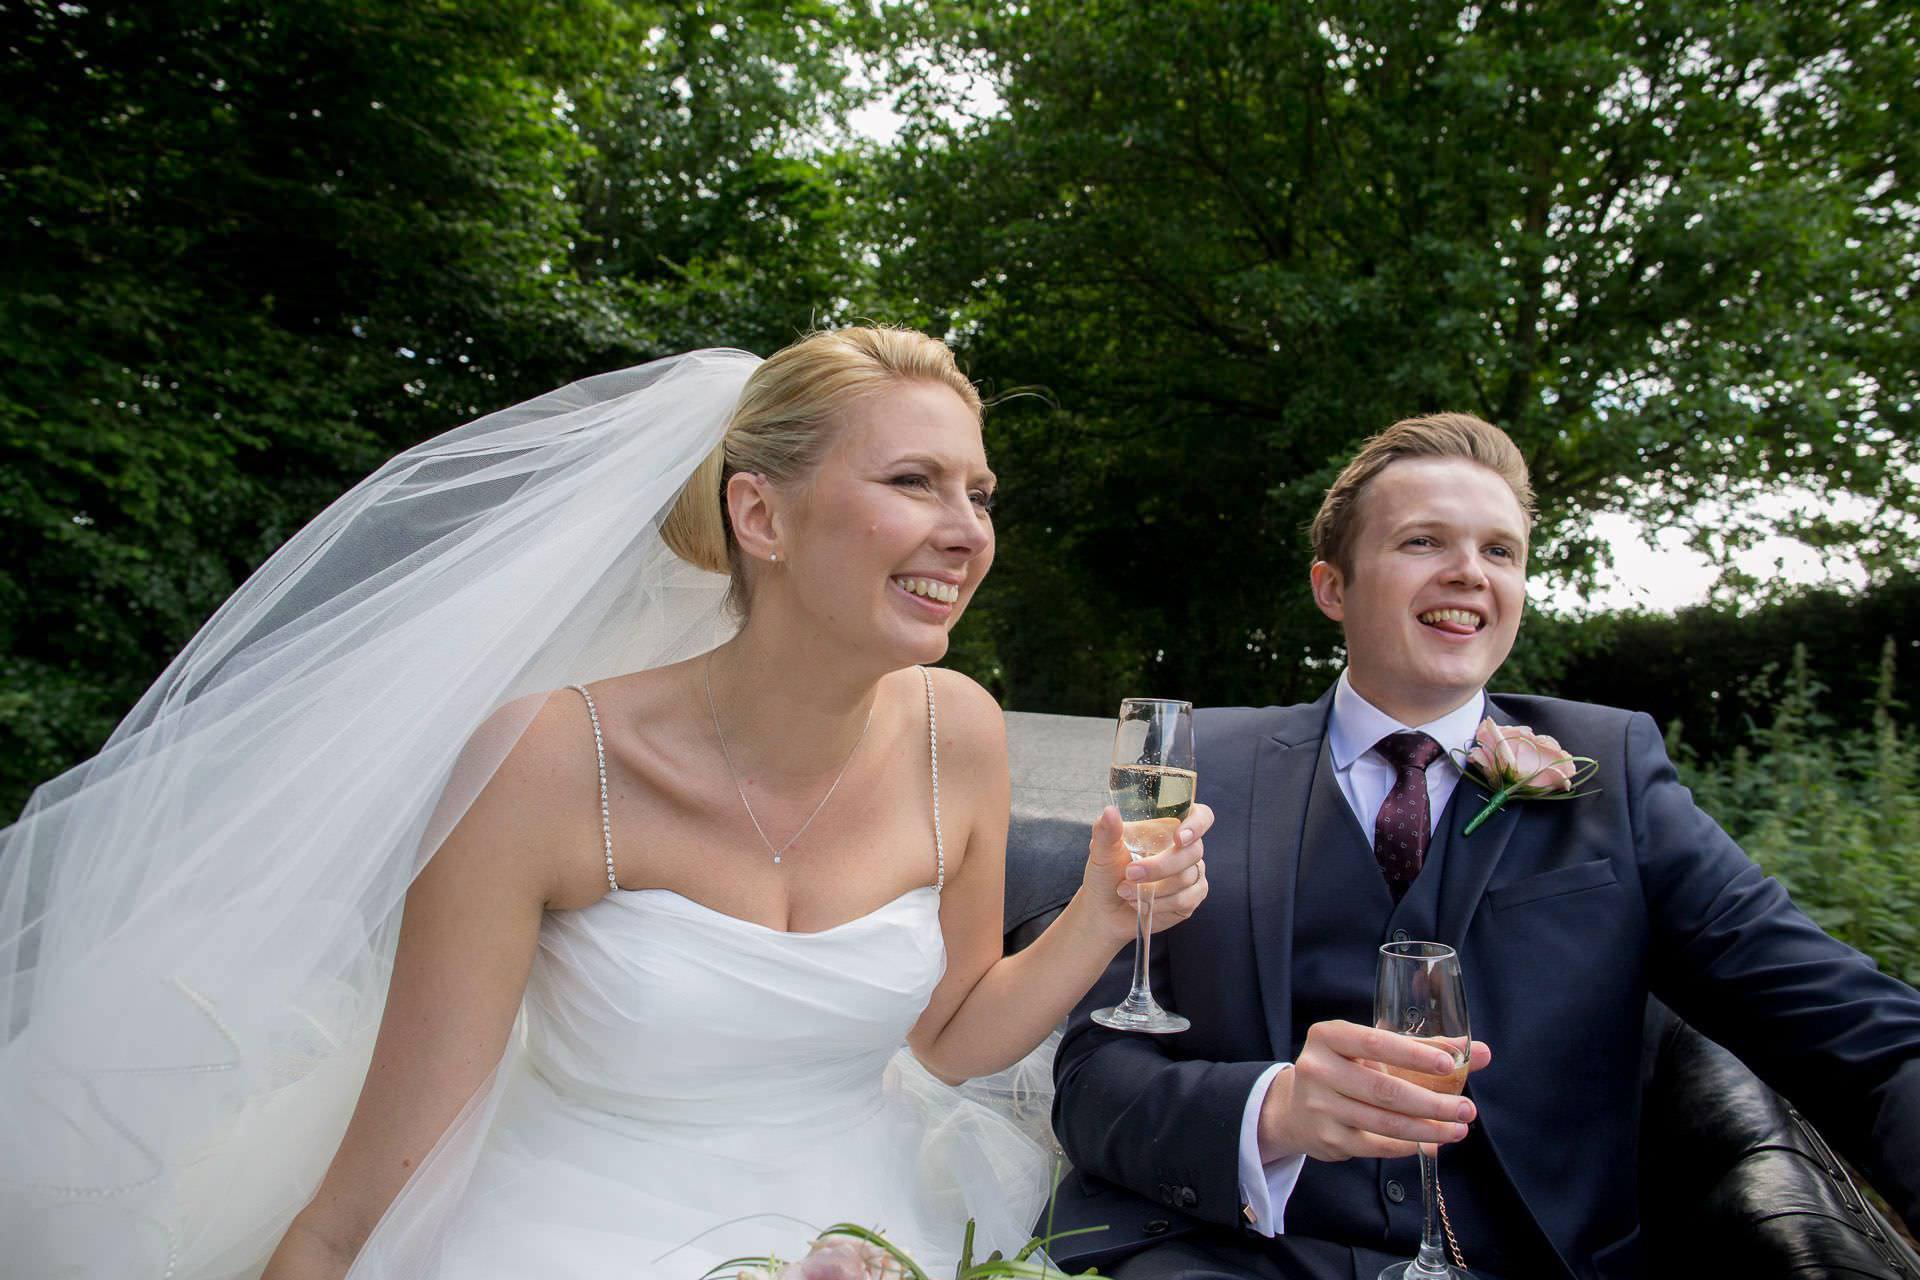 Wotton House wedding champagne glasses